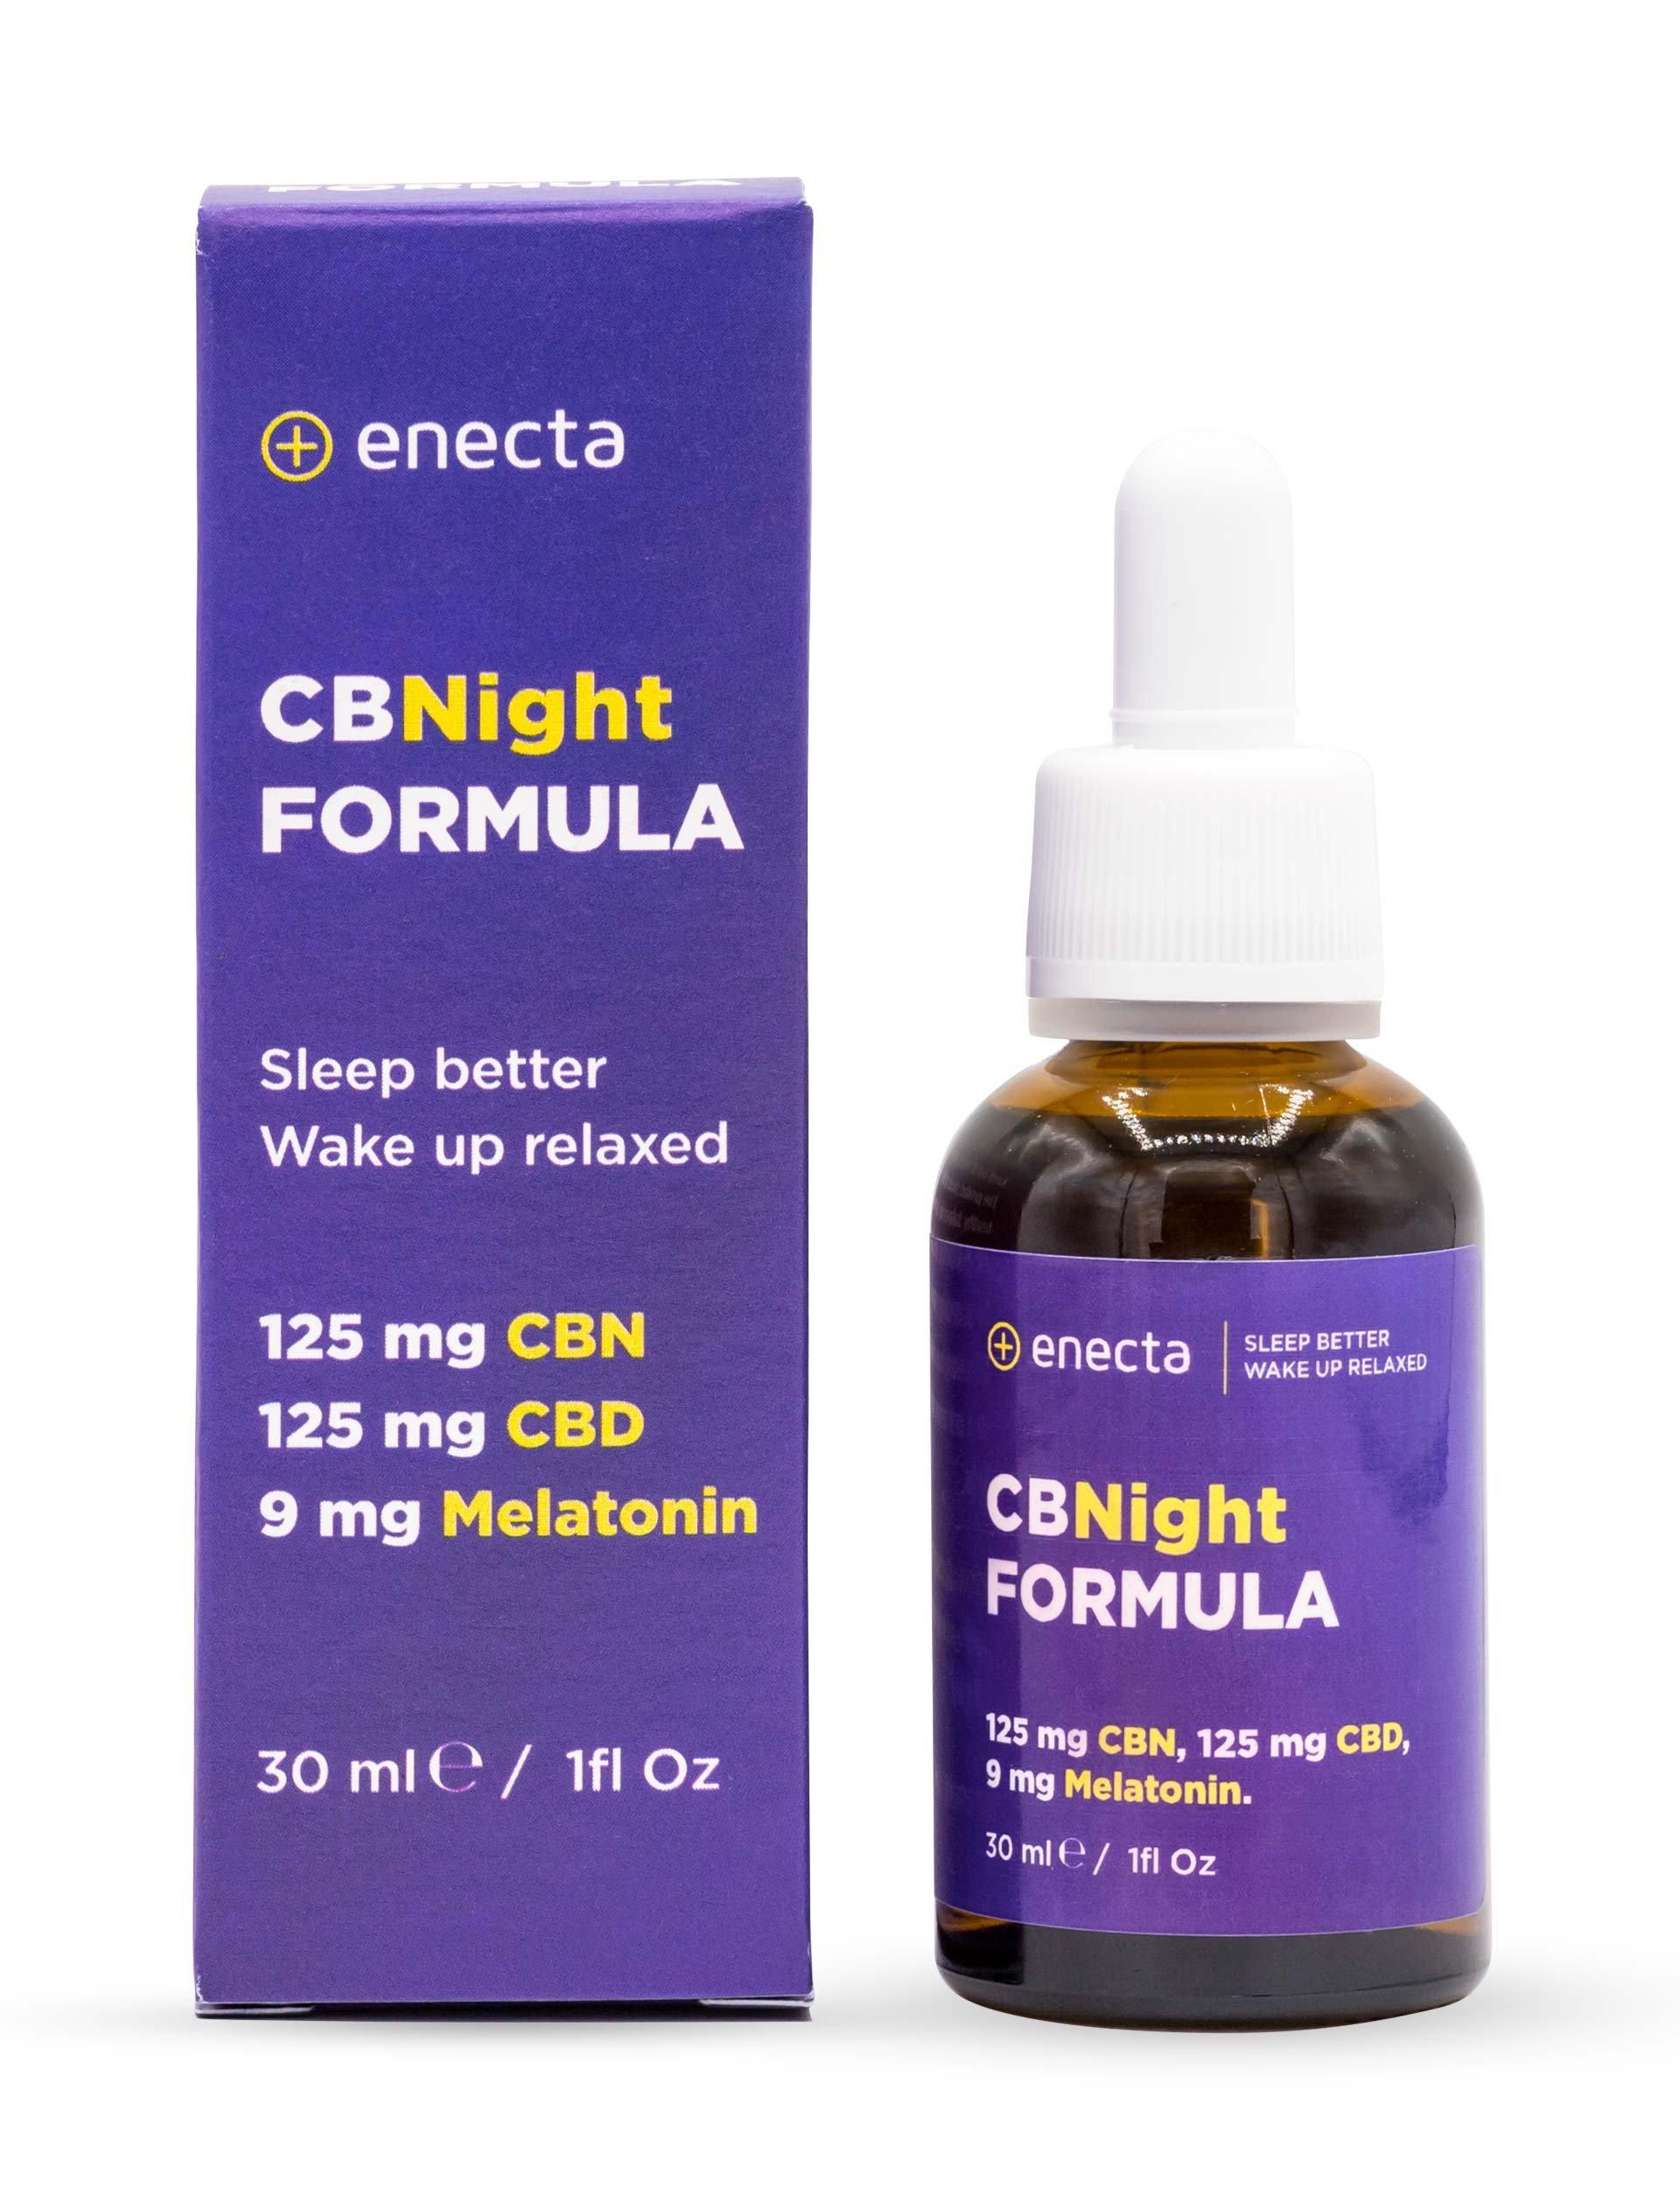 CBNIGHT-FORMULA